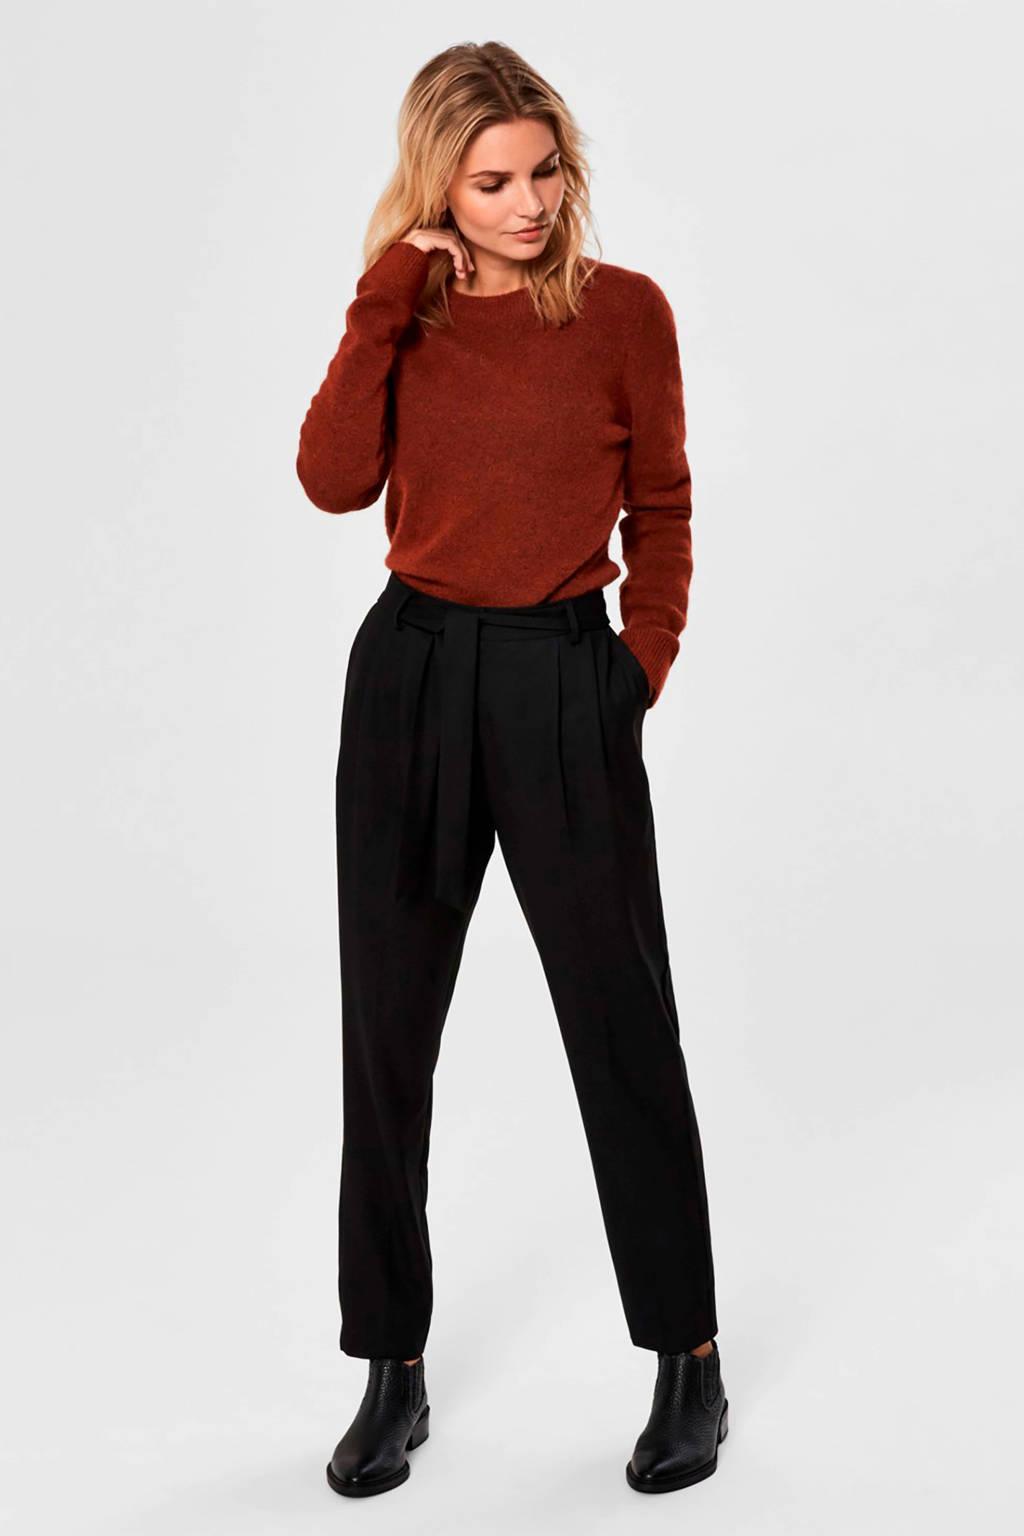 SELECTED FEMME tapered fit broek zwart, Zwart